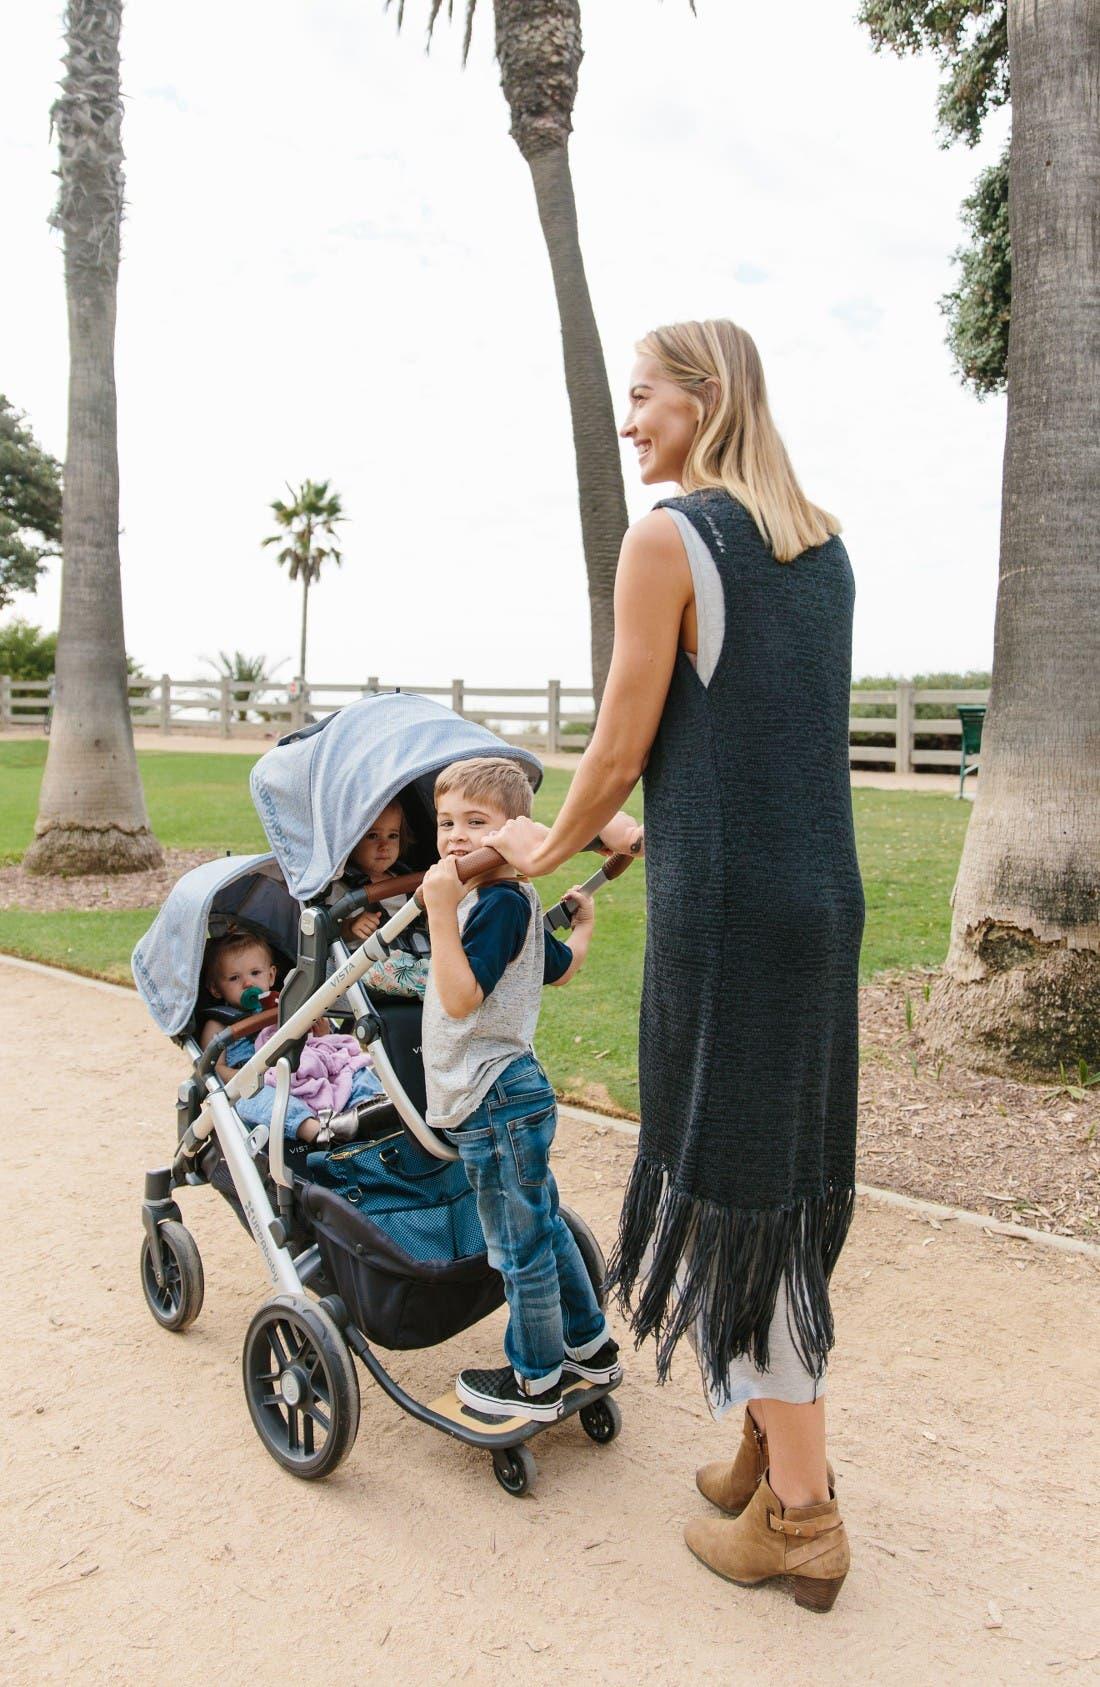 2017 VISTA Henry Aluminum Frame Convertible Stroller with Bassinet & Toddler Seat,                             Alternate thumbnail 9, color,                             Blue Marl